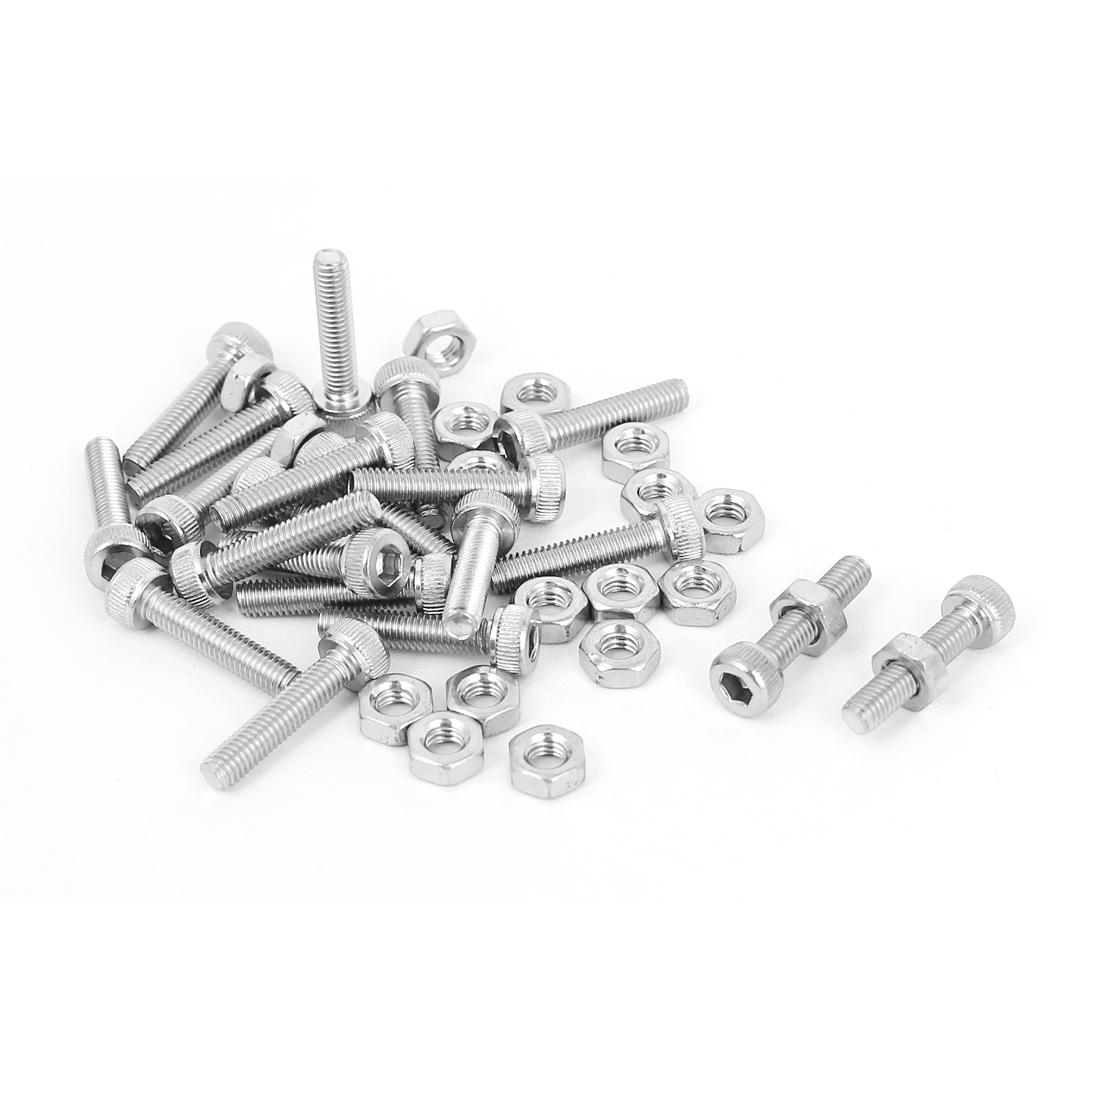 M3x14mm Stainless Steel Hex Socket Head Knurled Cap Screws Bolts Nut Set 20Pcs